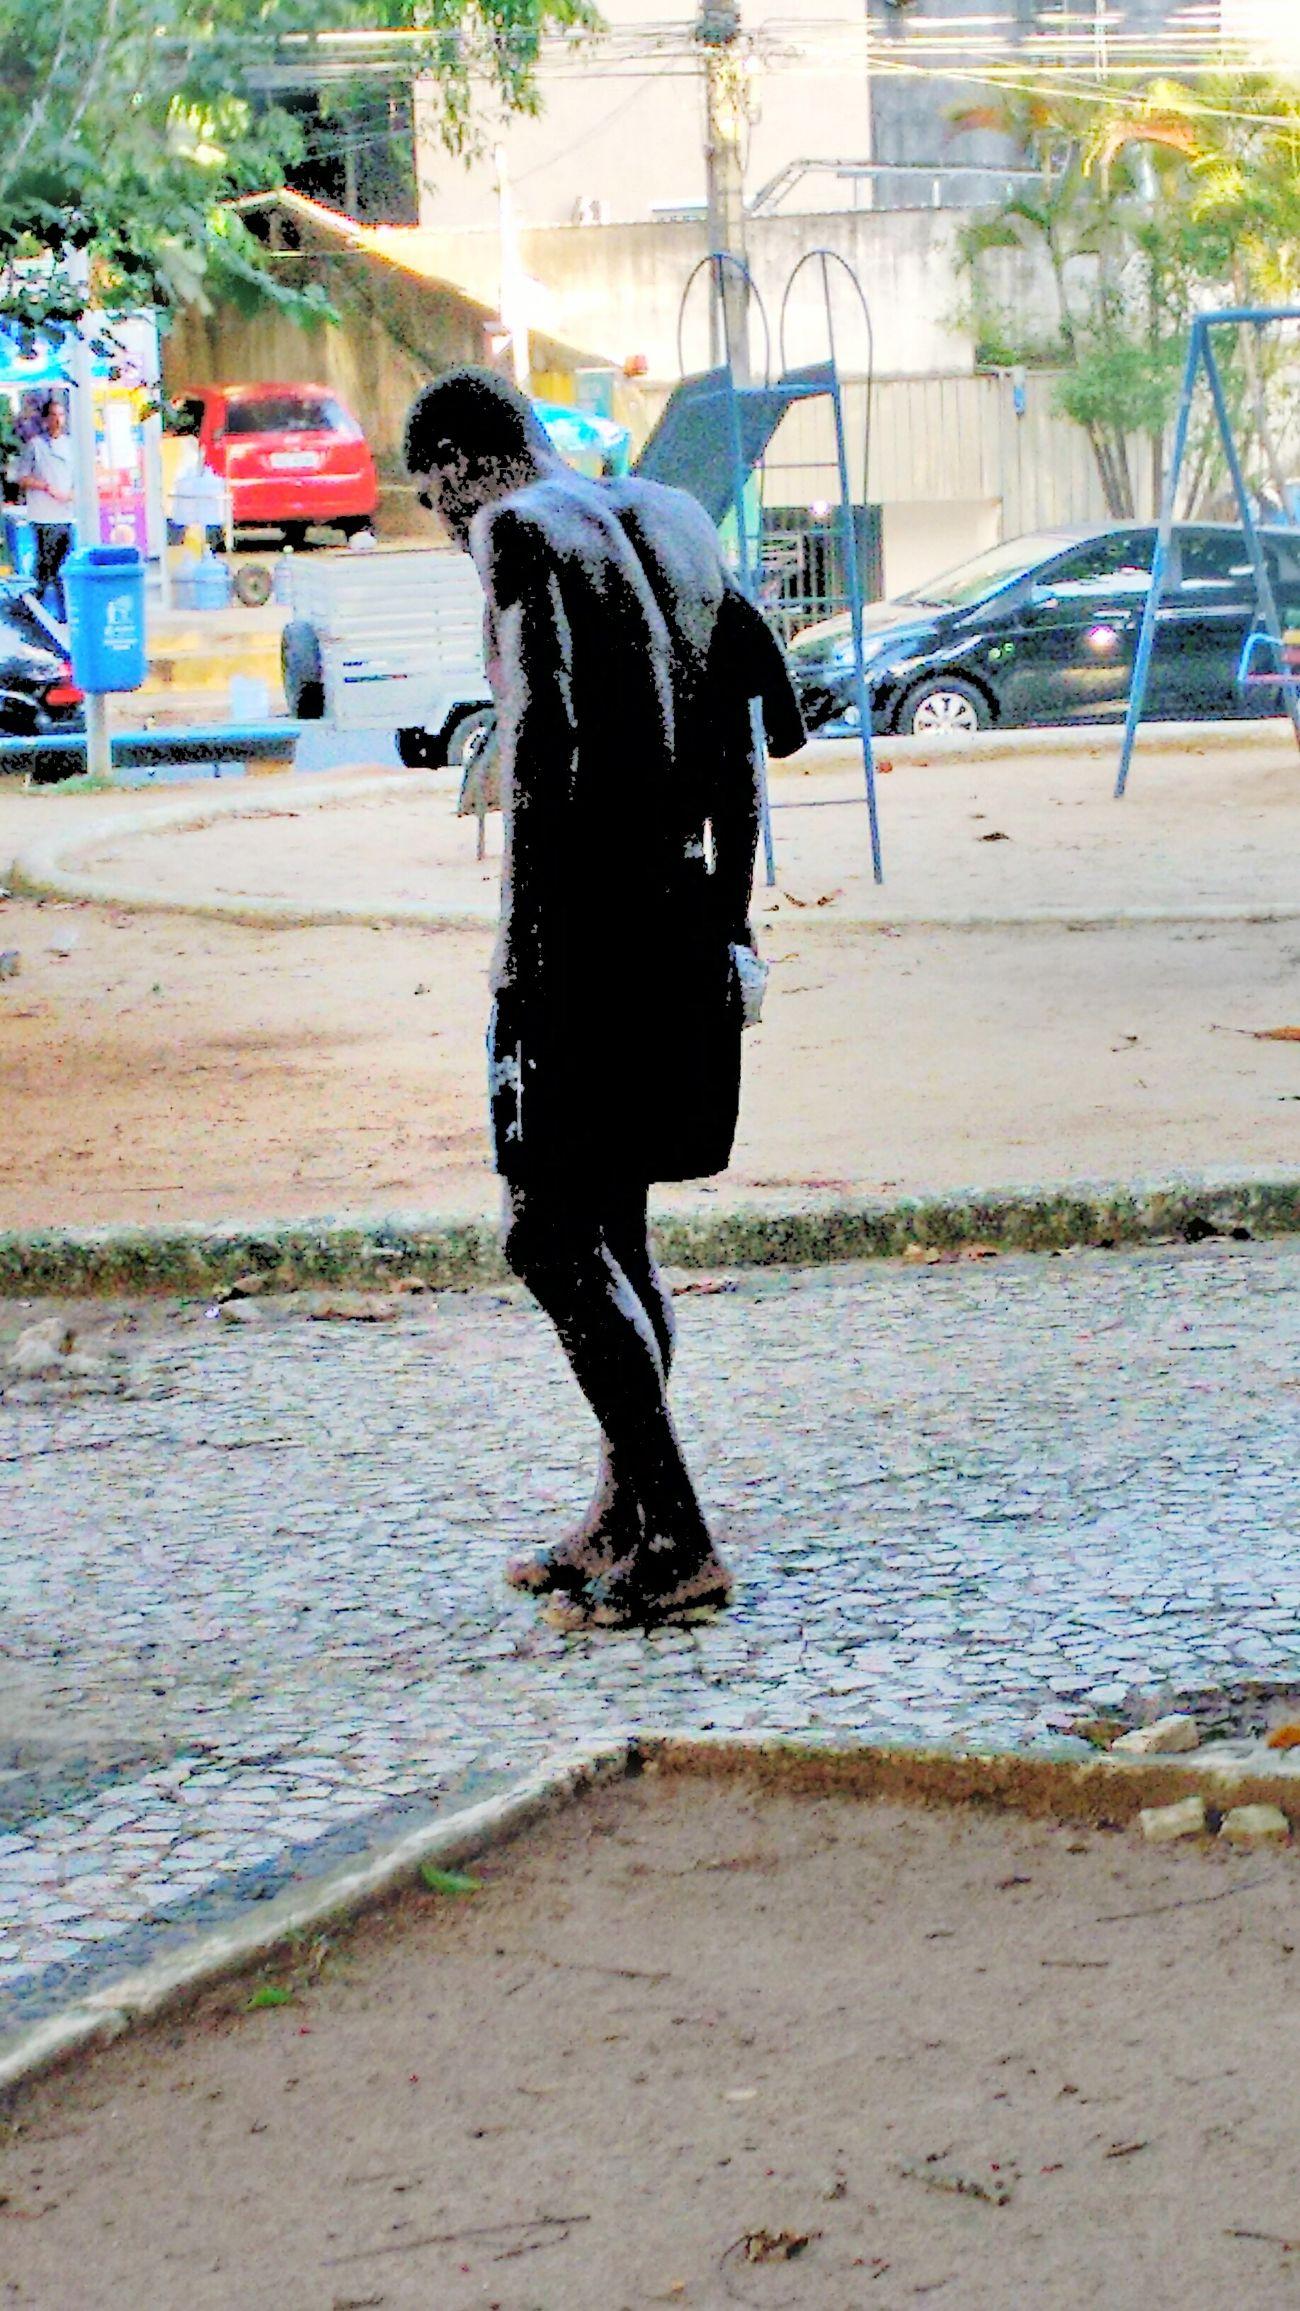 Ohomeminvisível Salvador Pobreza Miserable Realidadeurbana